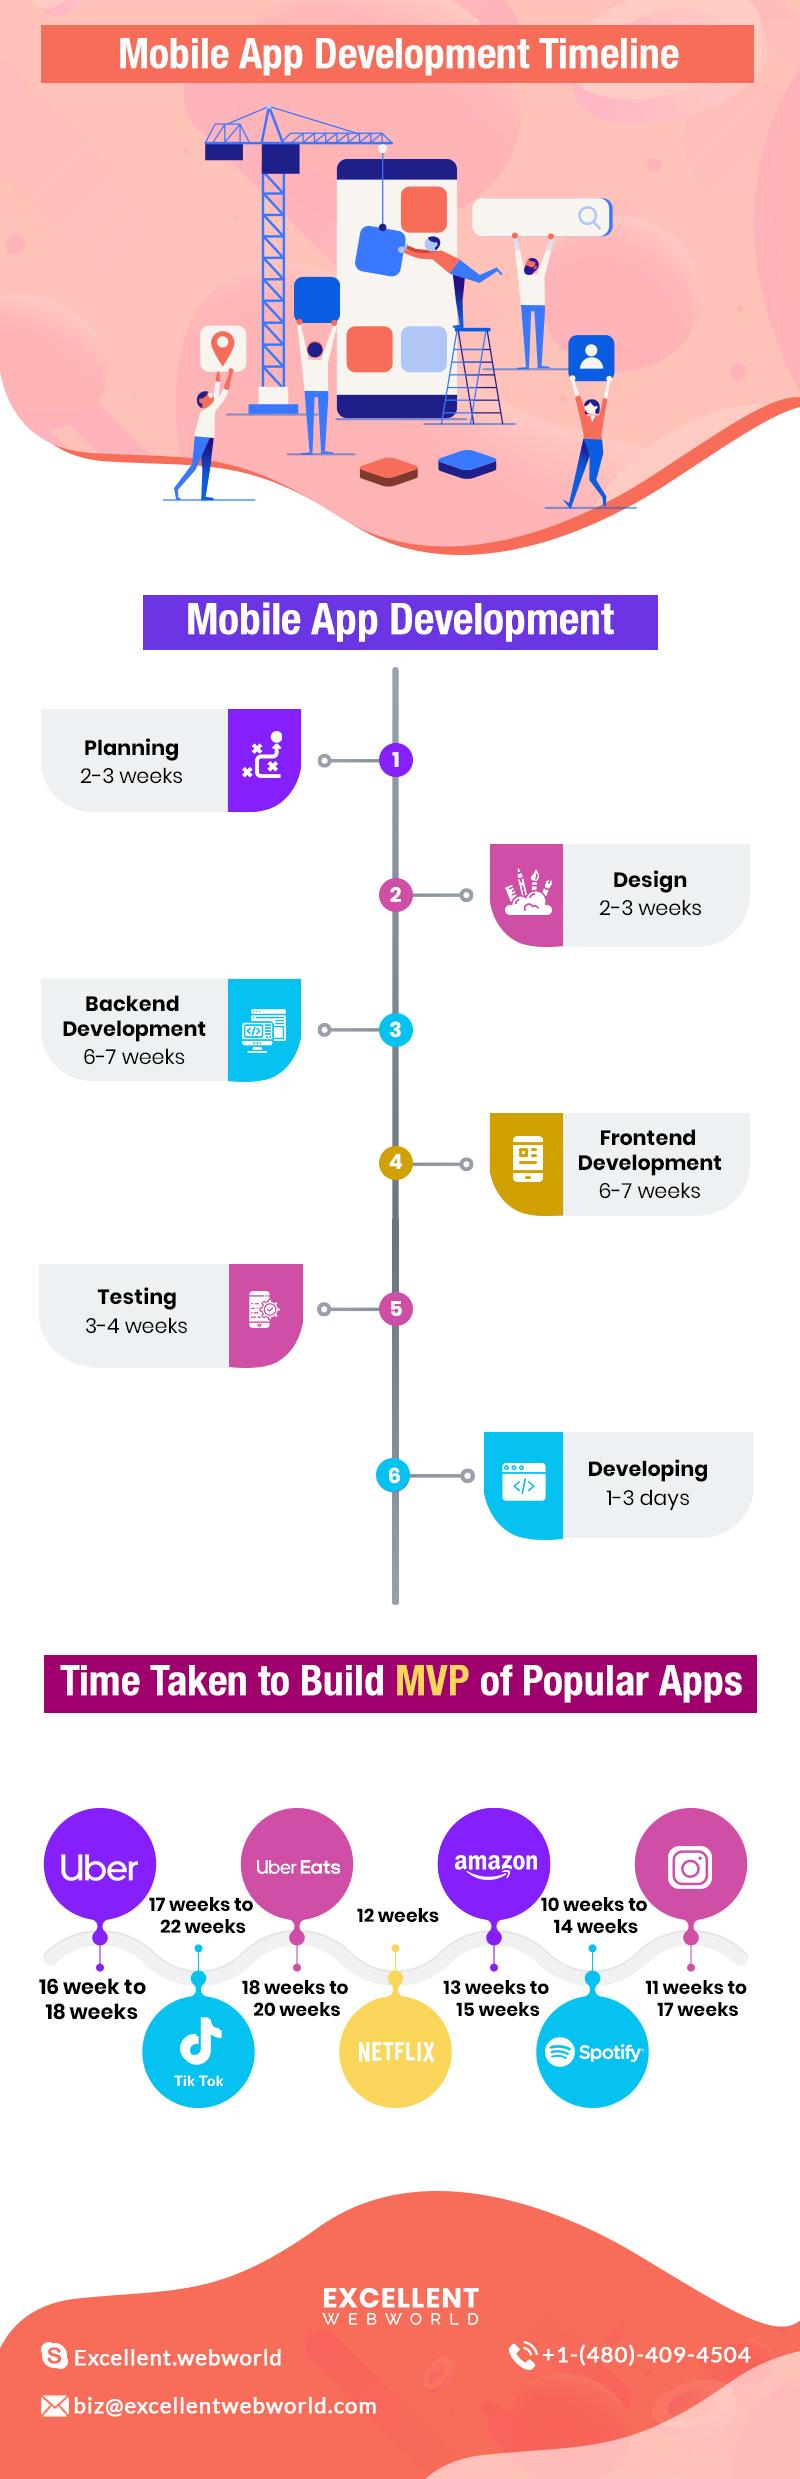 Mobile App Development Timeline Infographic